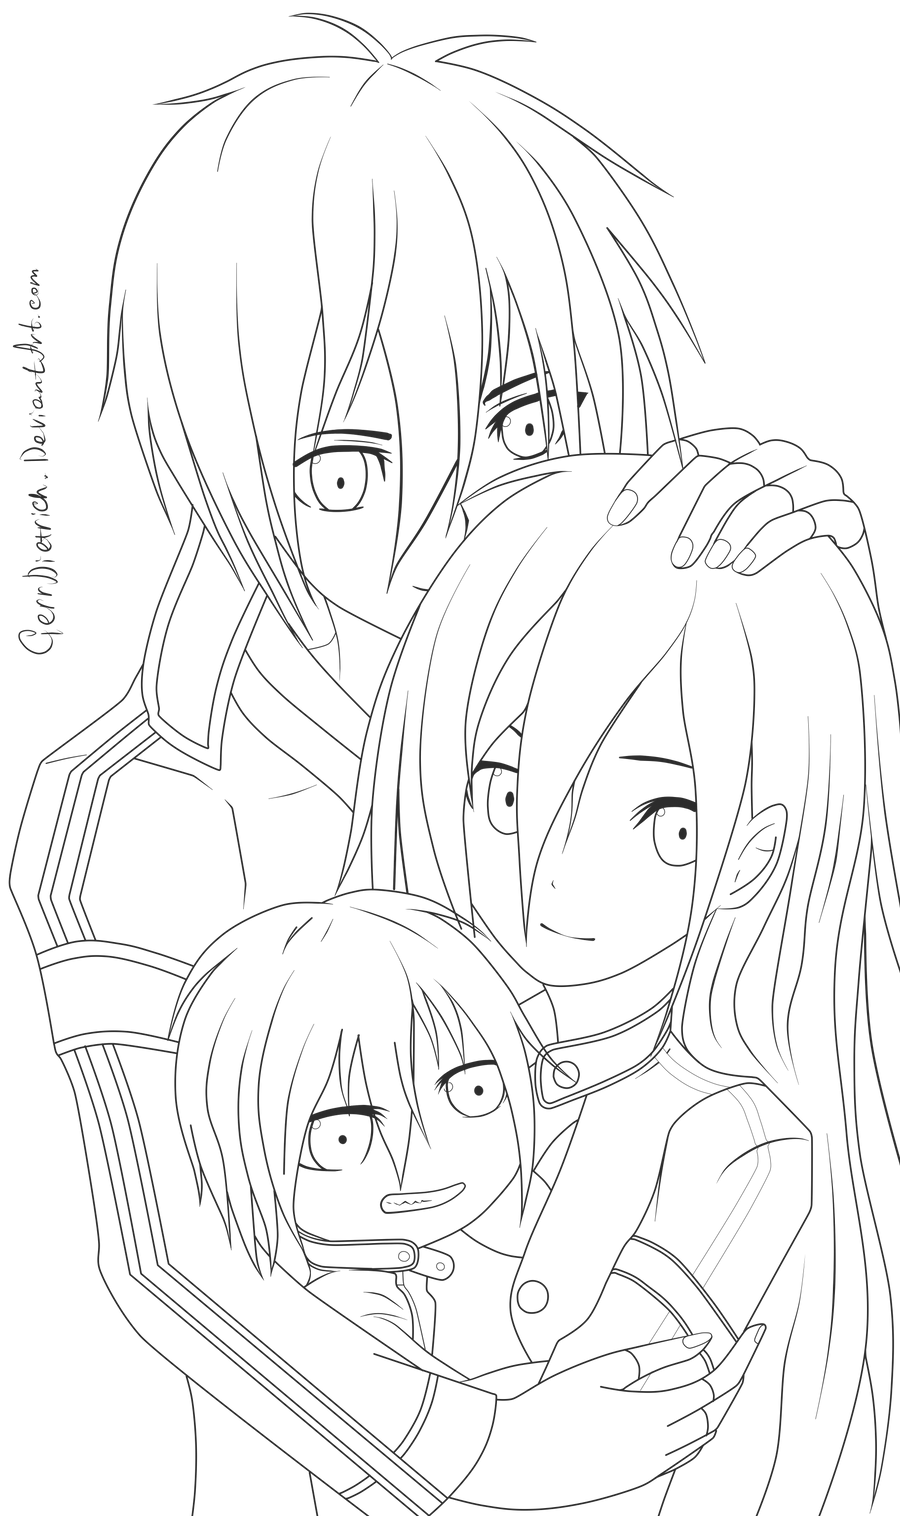 Kirito Lineart : Kirito lineart by gerrdietrich on deviantart